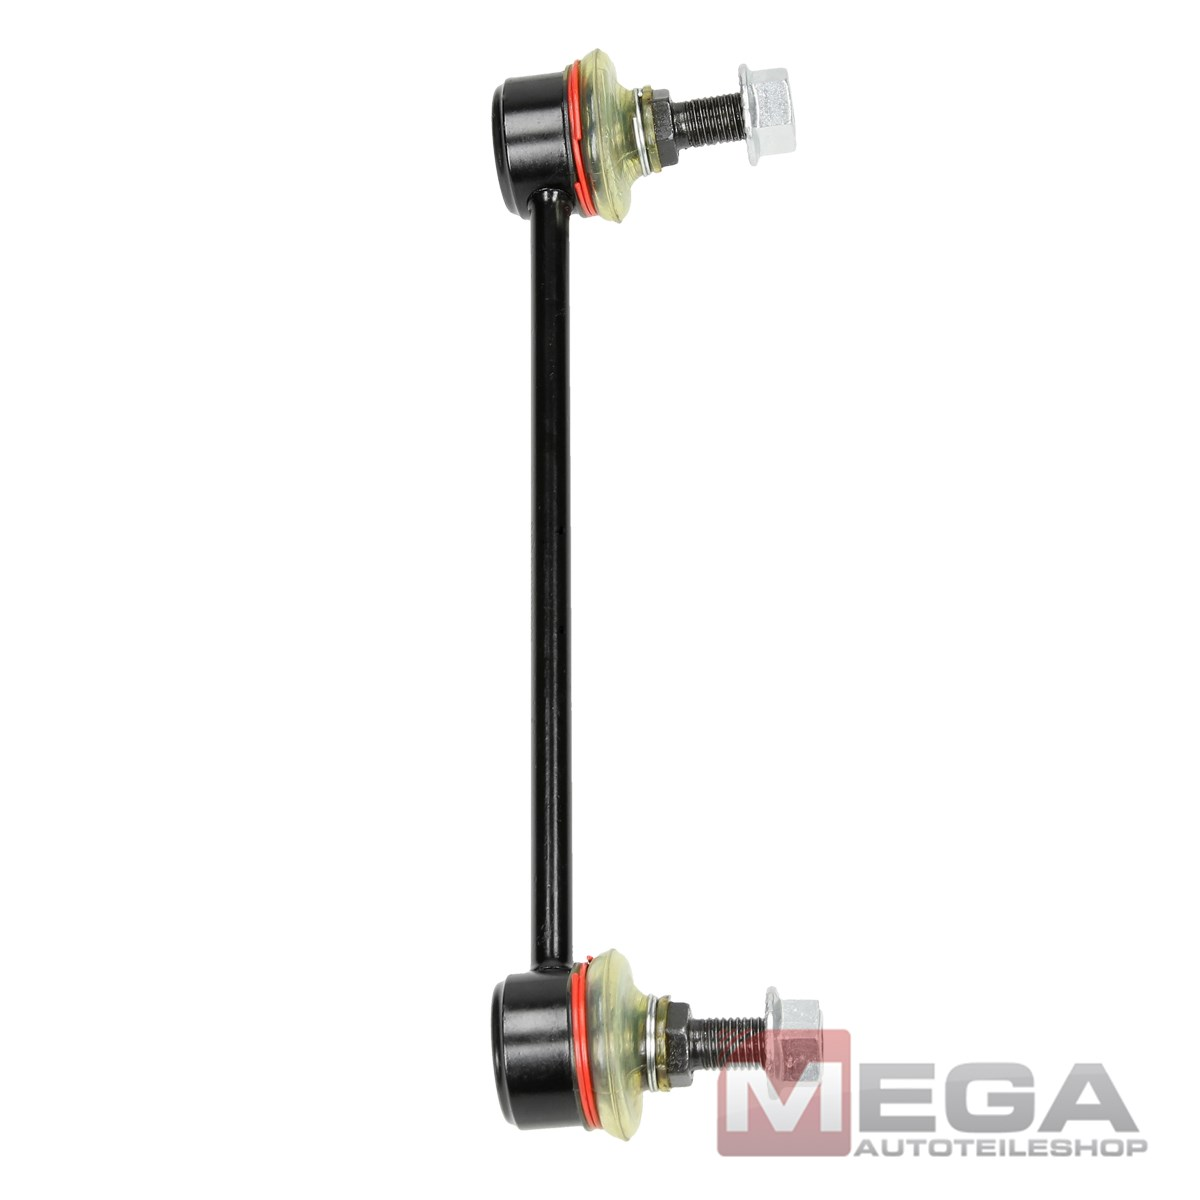 Koppelstange Stange Strebe Stabilisator Vorderachse Links